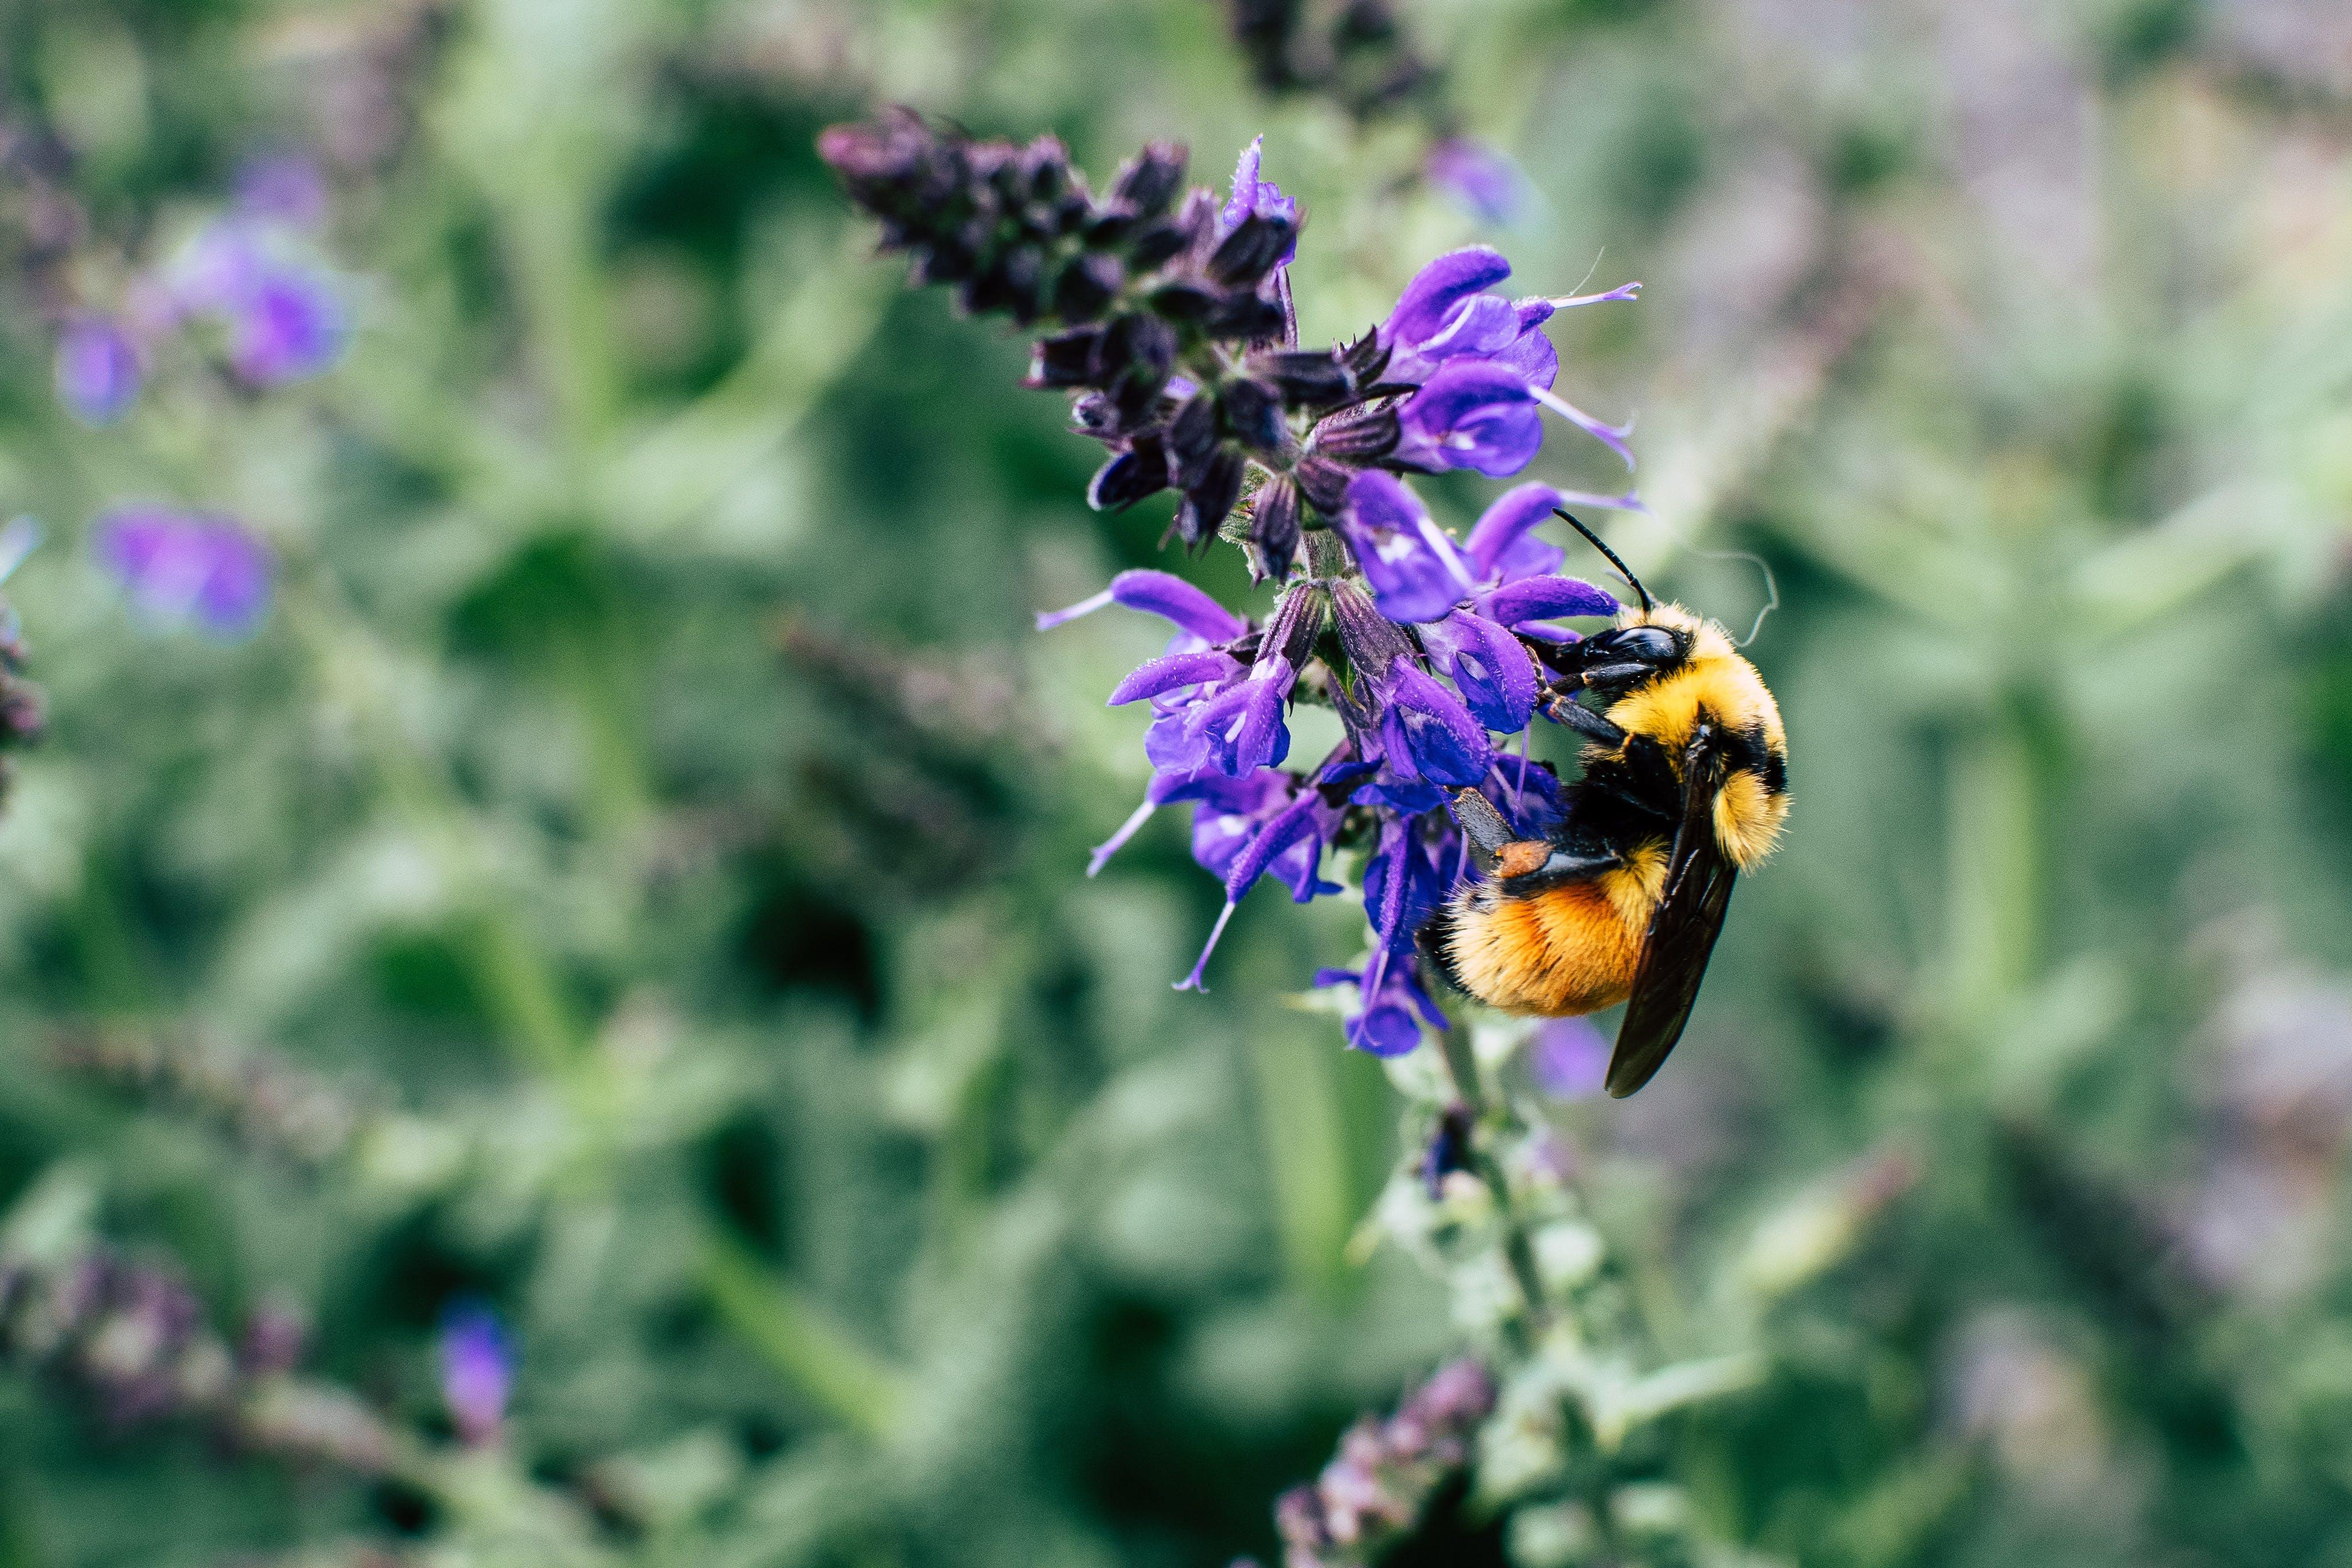 Macro Shot Of Black and Yellow Bee On Purple Flower